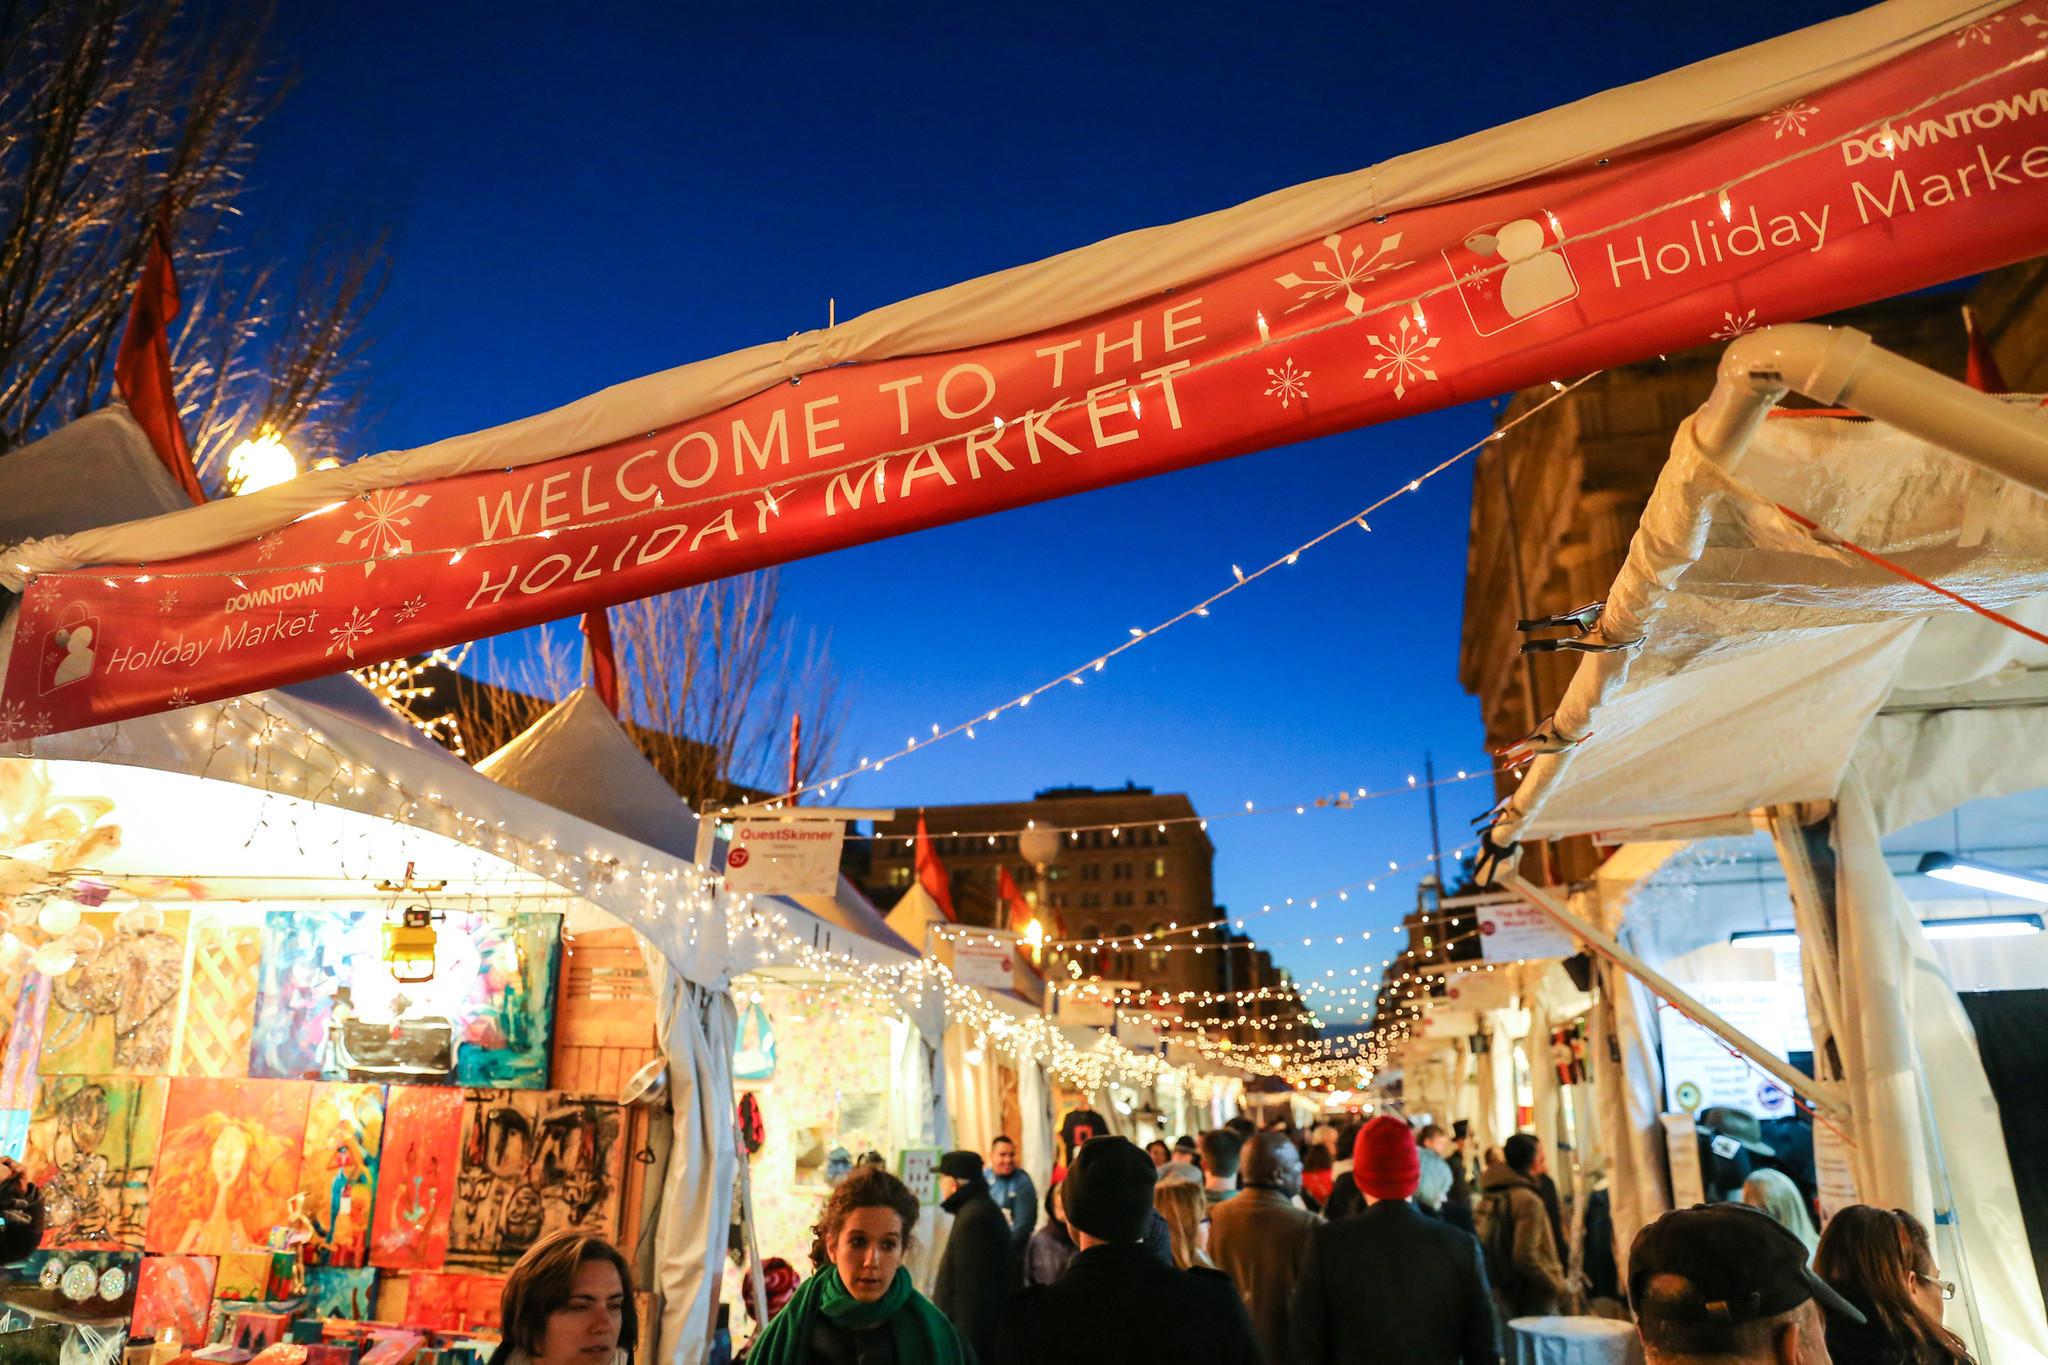 Christkindls Other Holiday Markets On East Coast Work Old